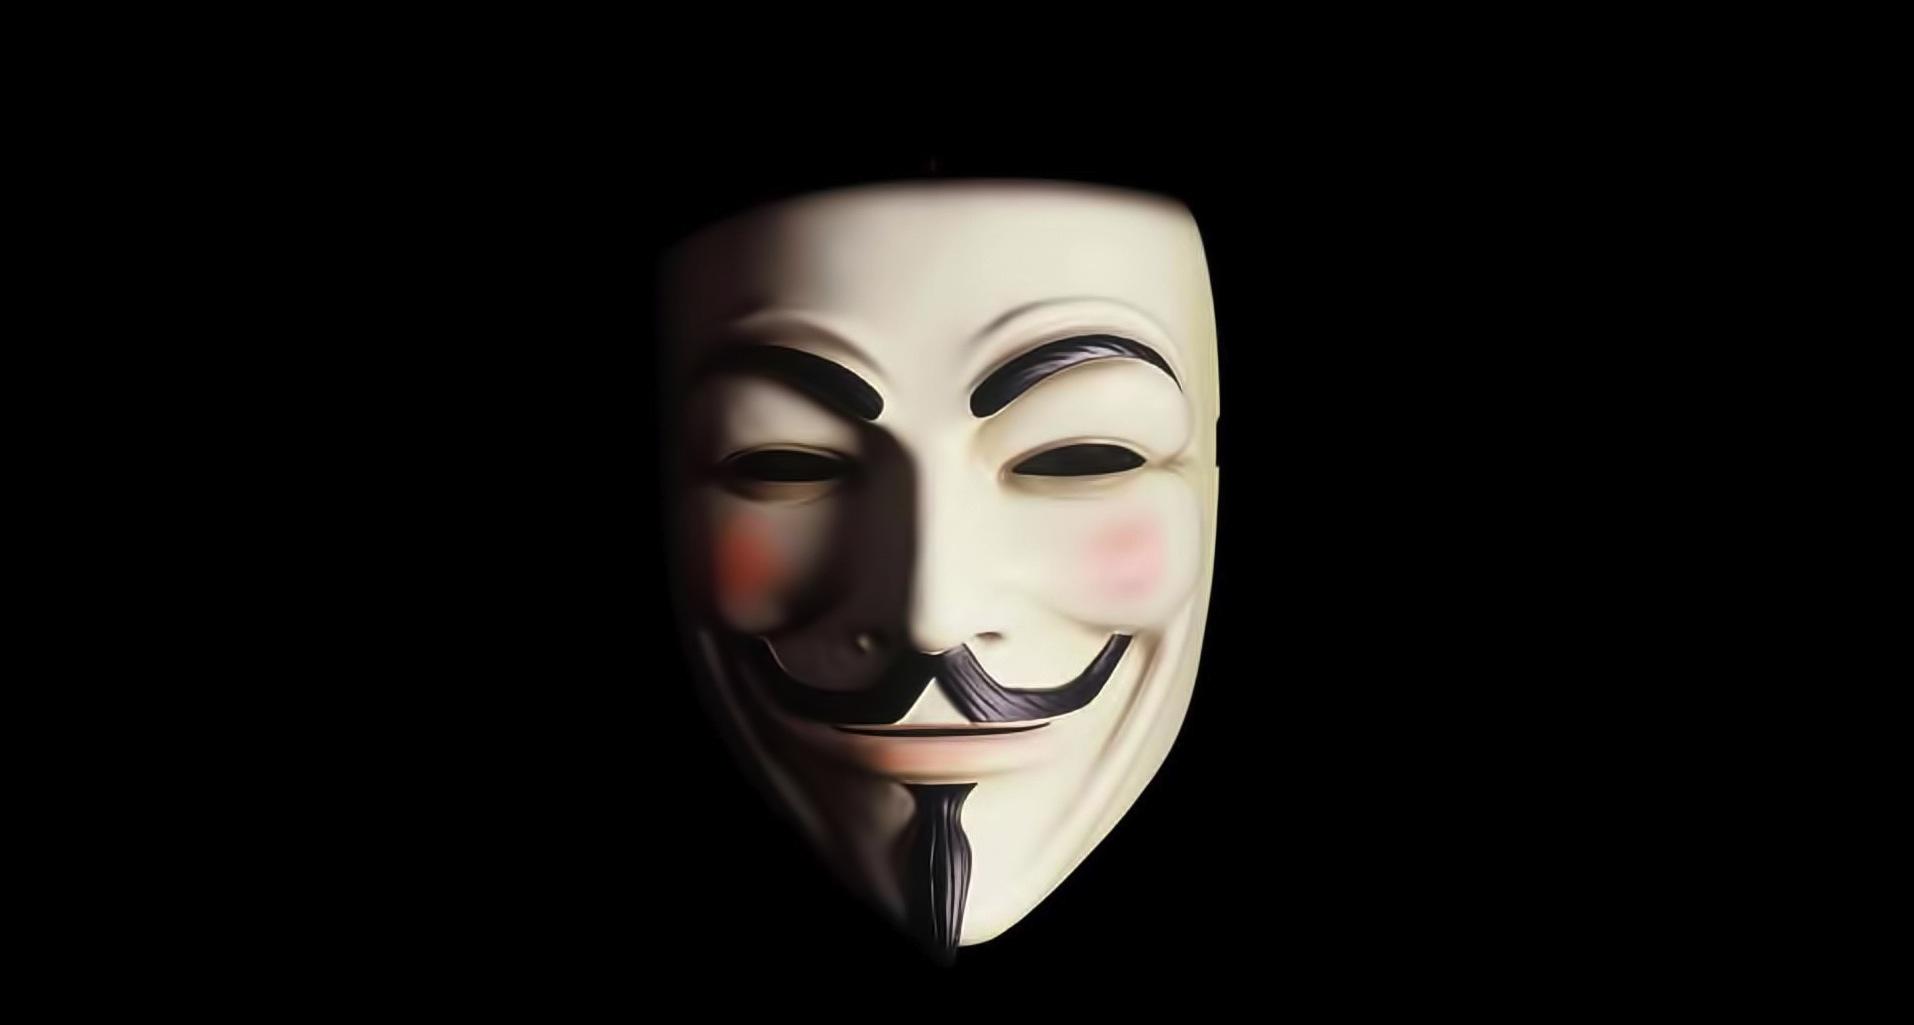 1-vendetta-guy-fawkes-mask-on-black